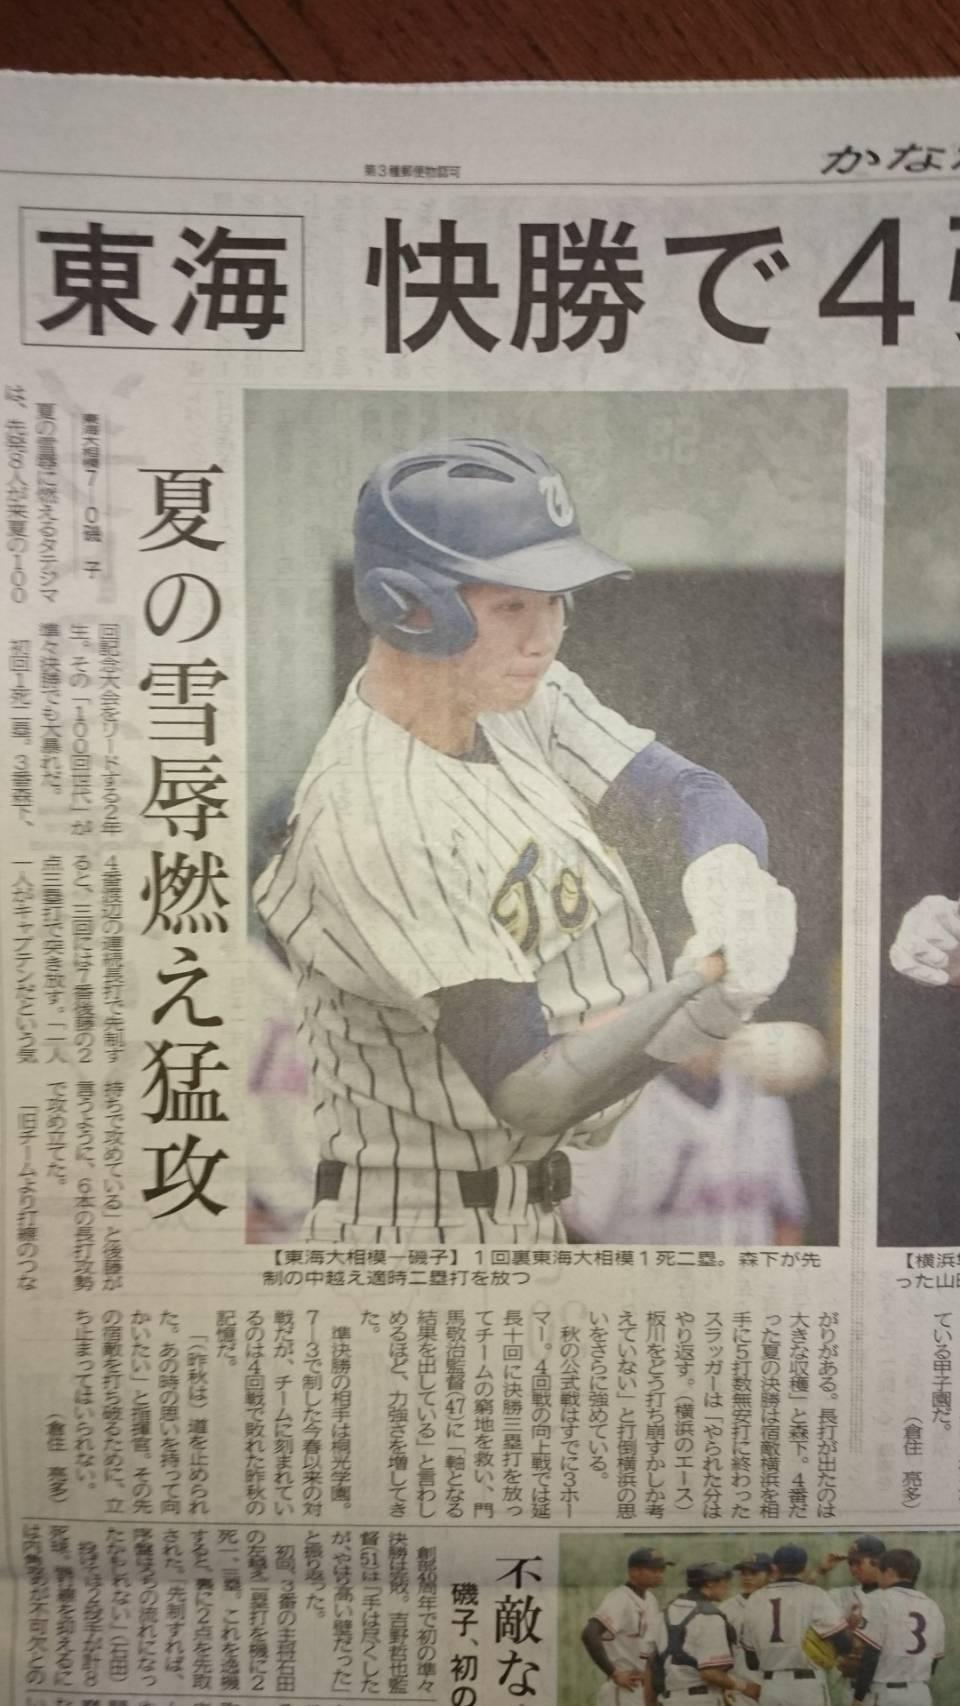 渡辺勝 (野球)の画像 p1_16